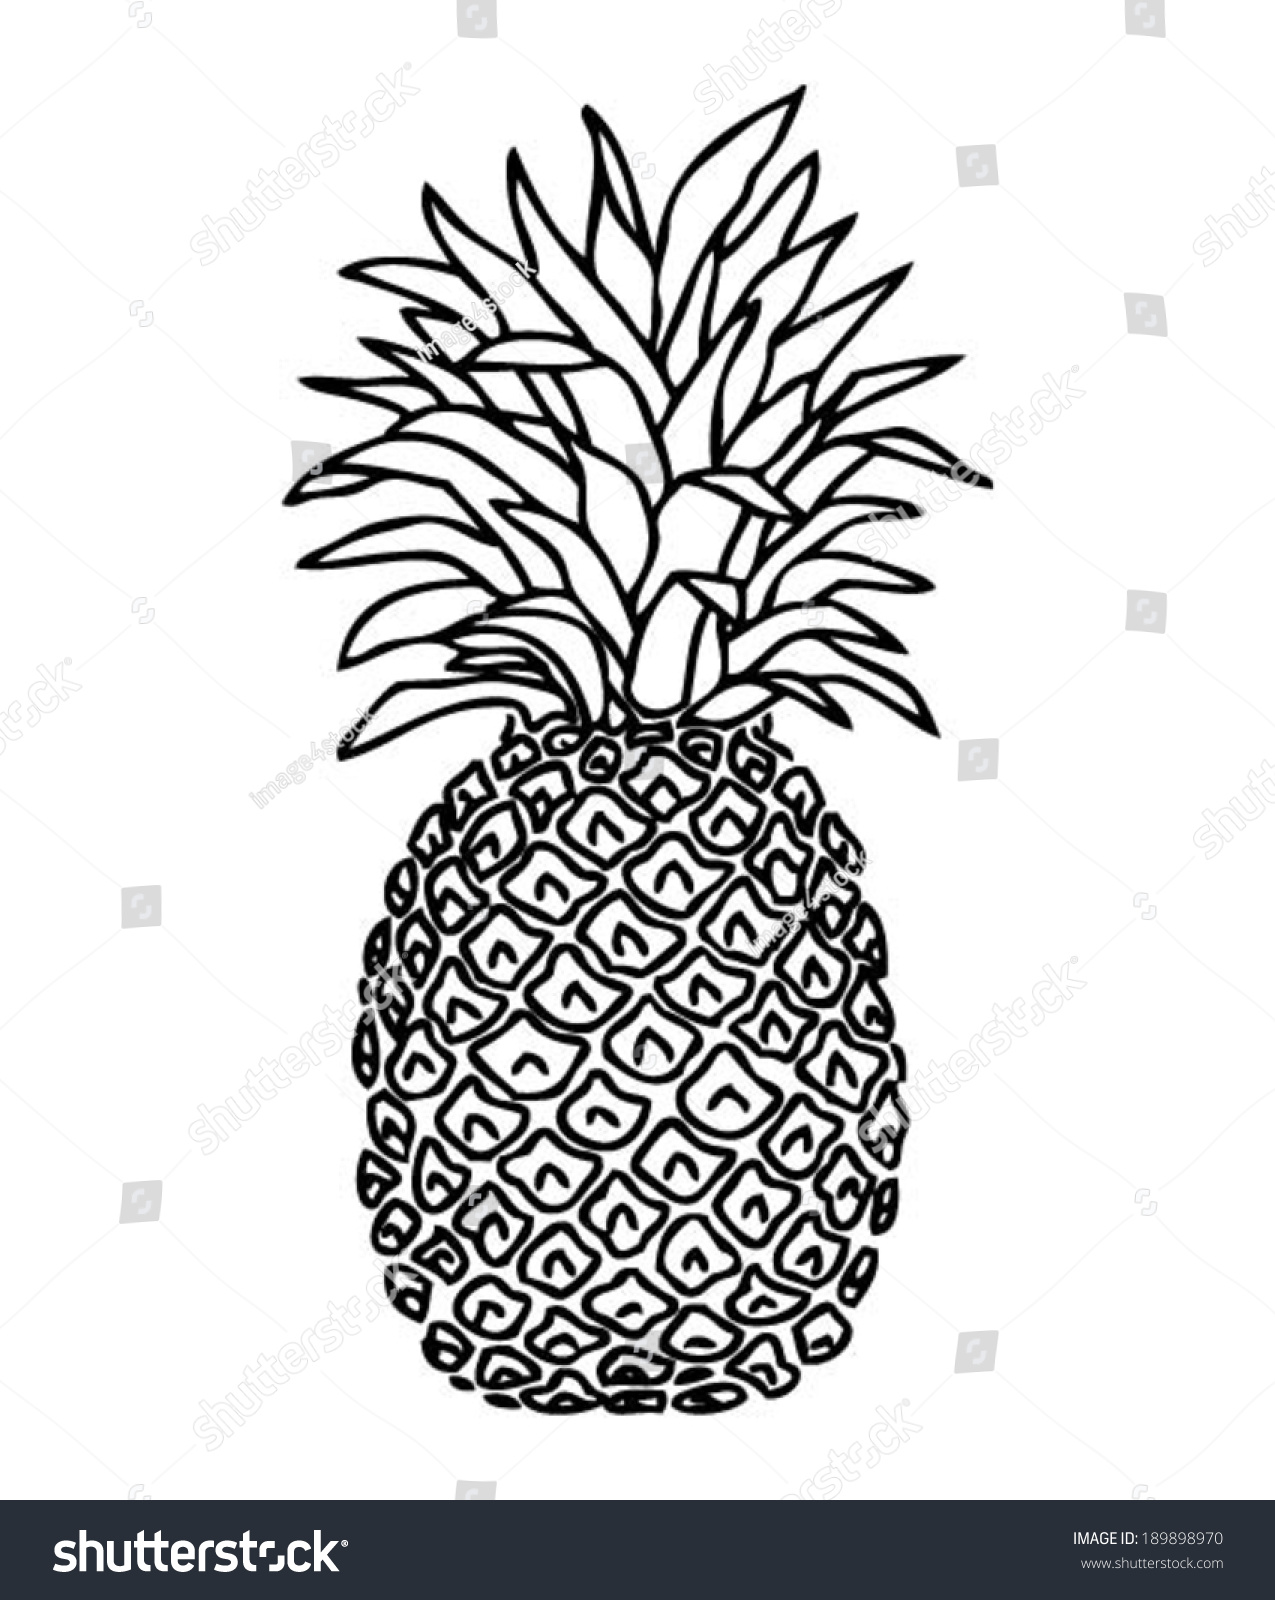 Pineapple Handdrawn Tshirt Design Cool Doodle Stock Vector